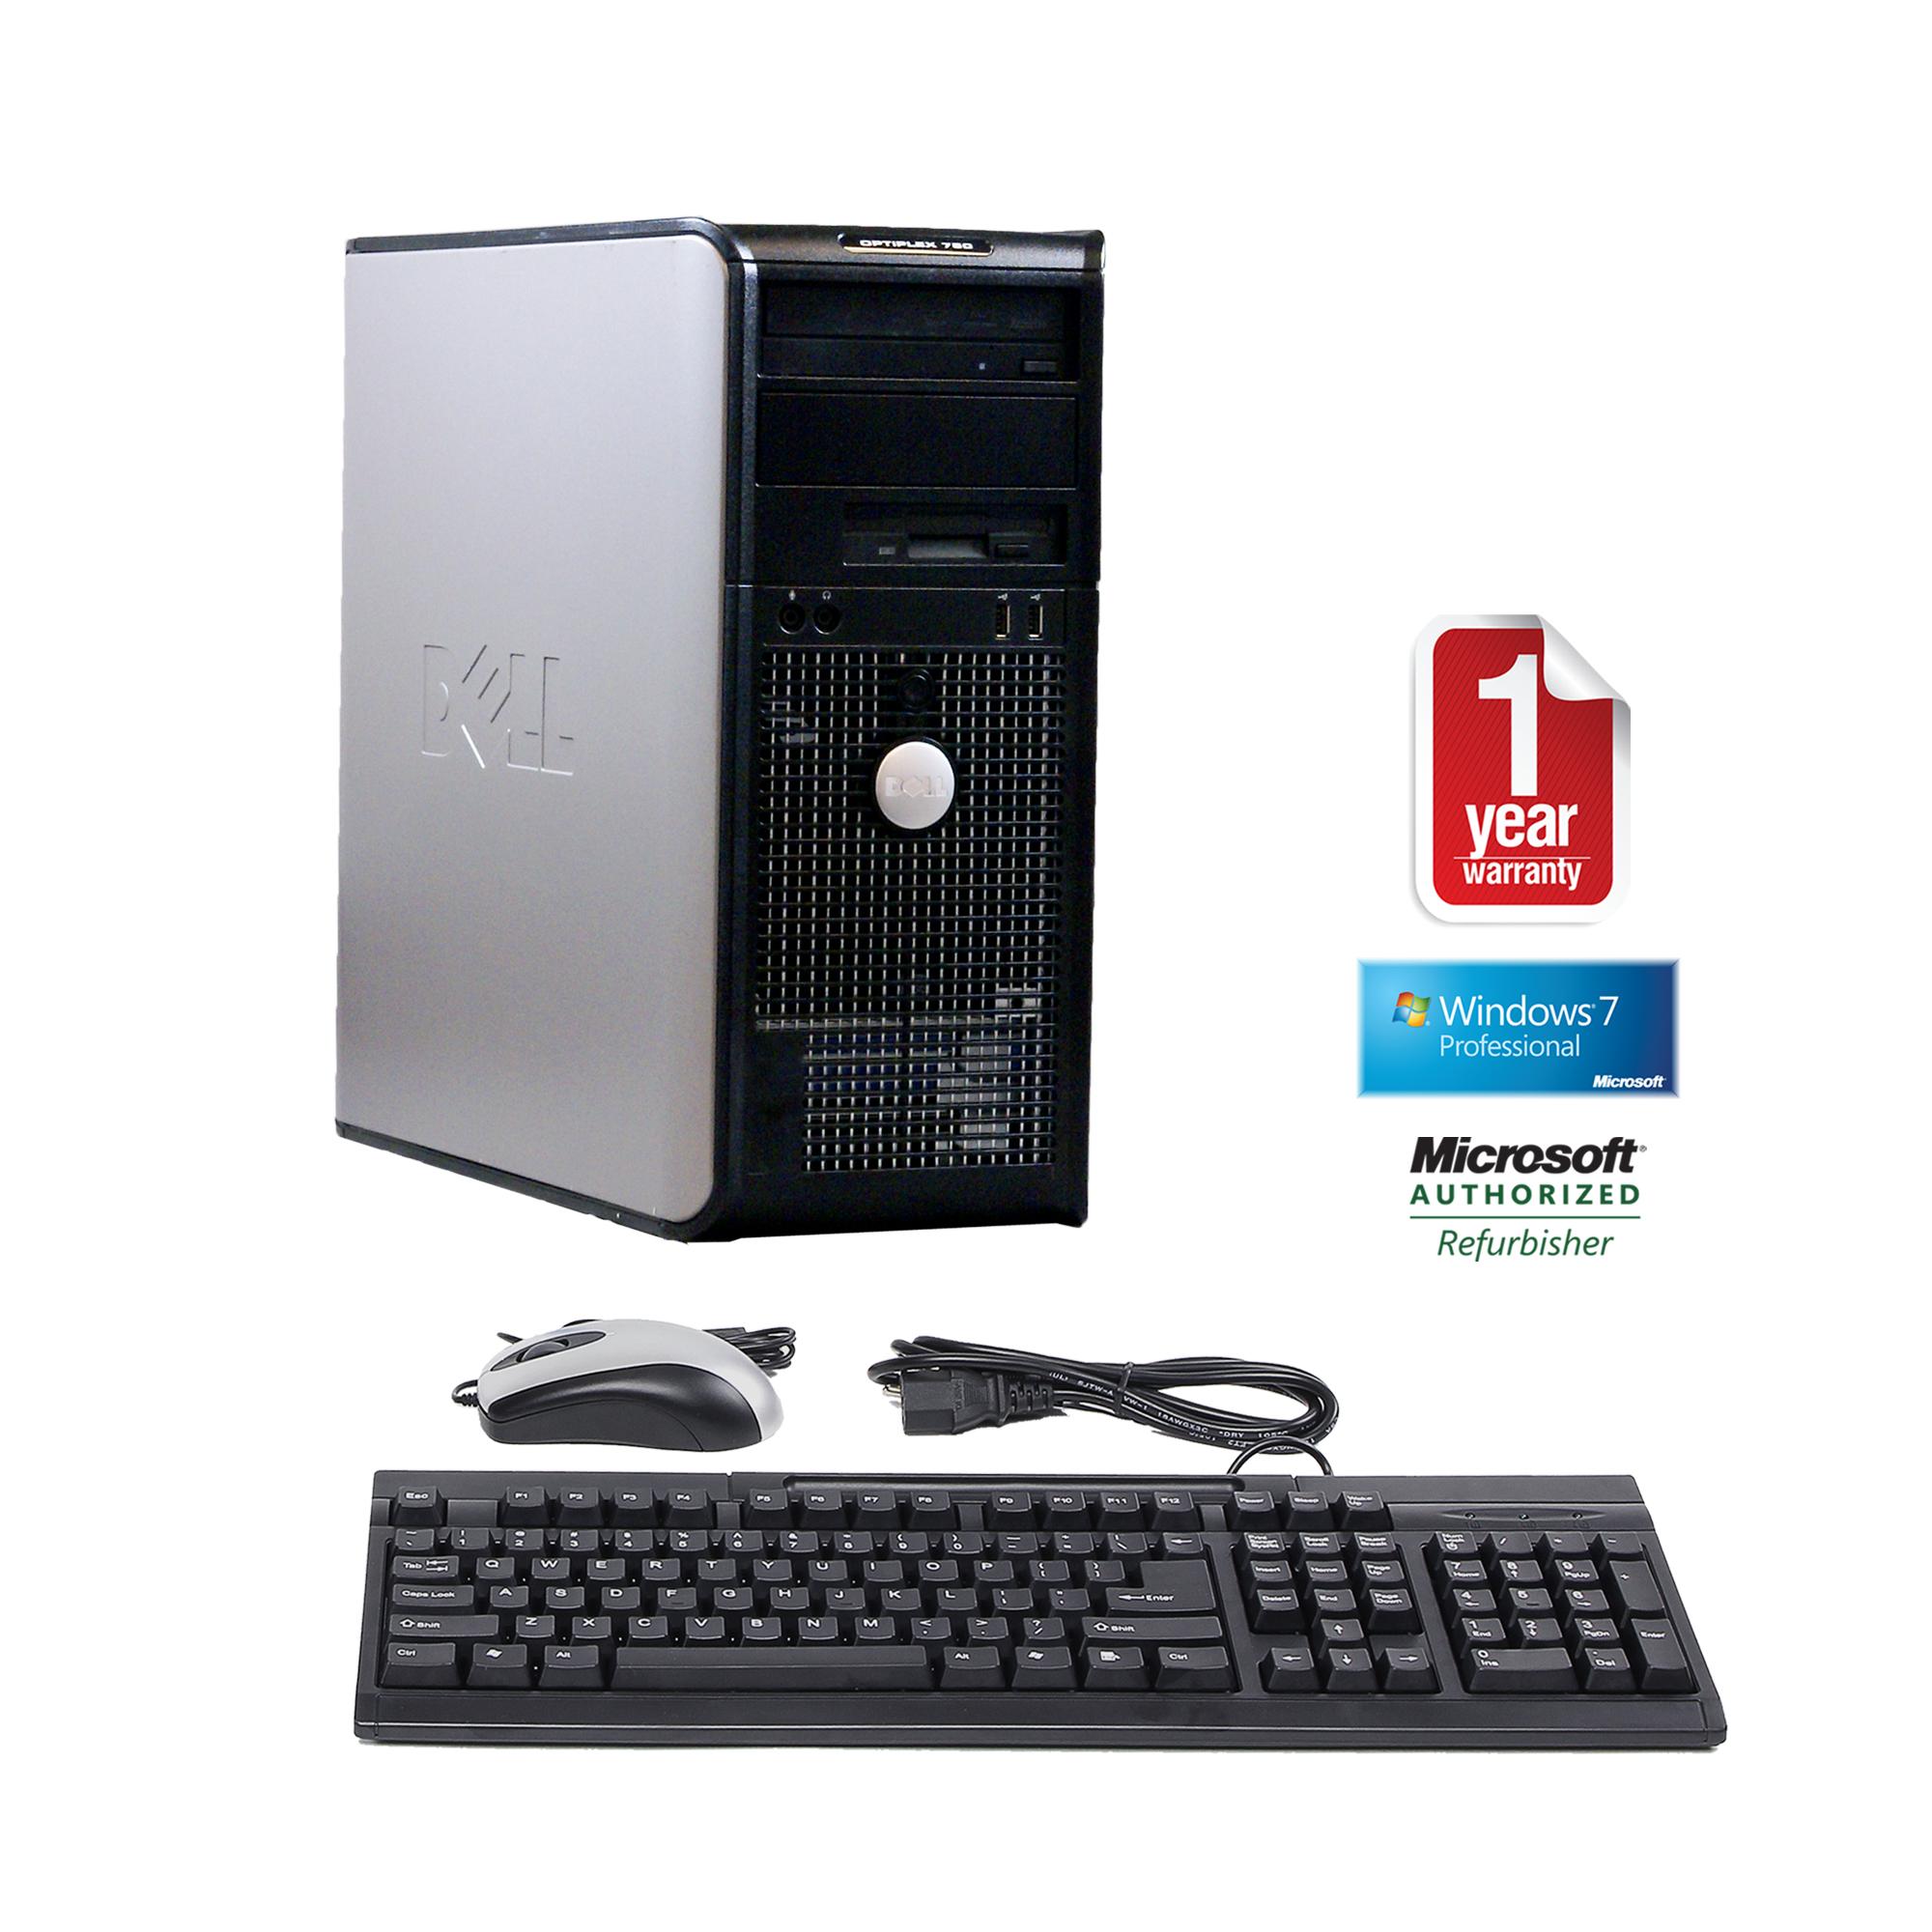 Dell 760 refurbished midtower form factor C2D 2.8/4096/750/DVDRW/W7P-64